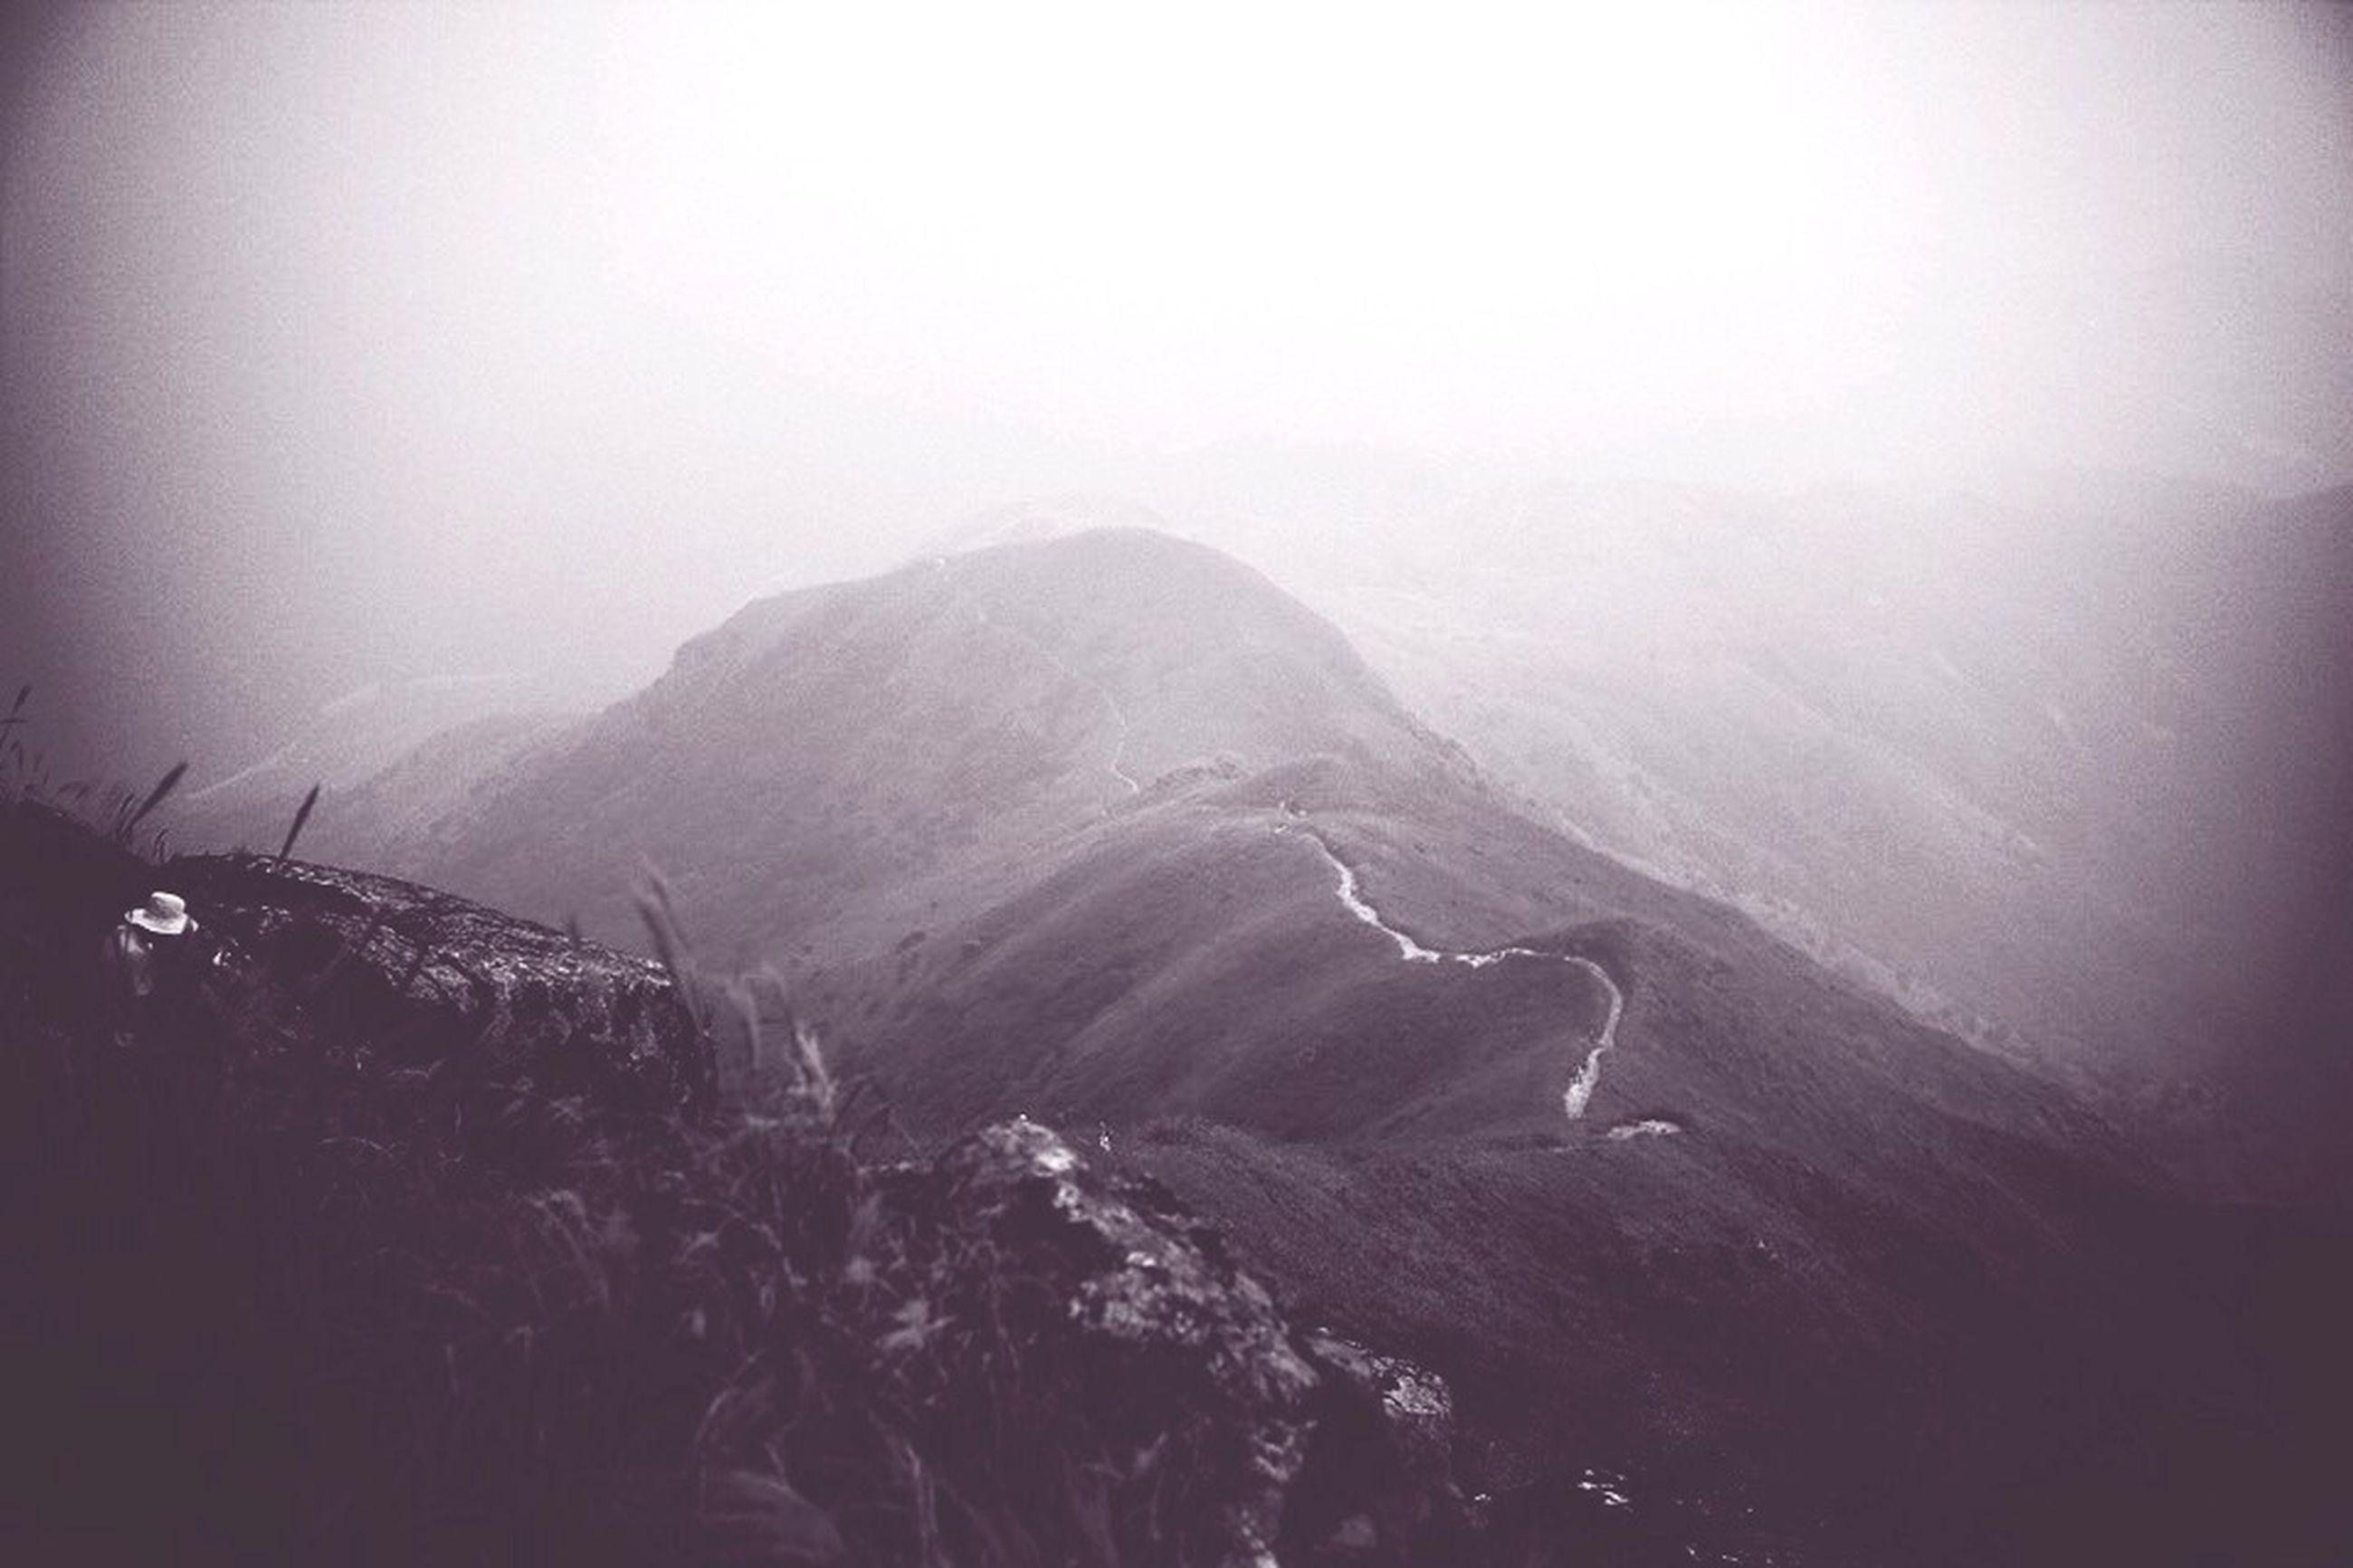 mountain, winter, snow, cold temperature, tranquil scene, scenics, tranquility, beauty in nature, weather, nature, copy space, clear sky, mountain range, season, non-urban scene, idyllic, sky, landscape, remote